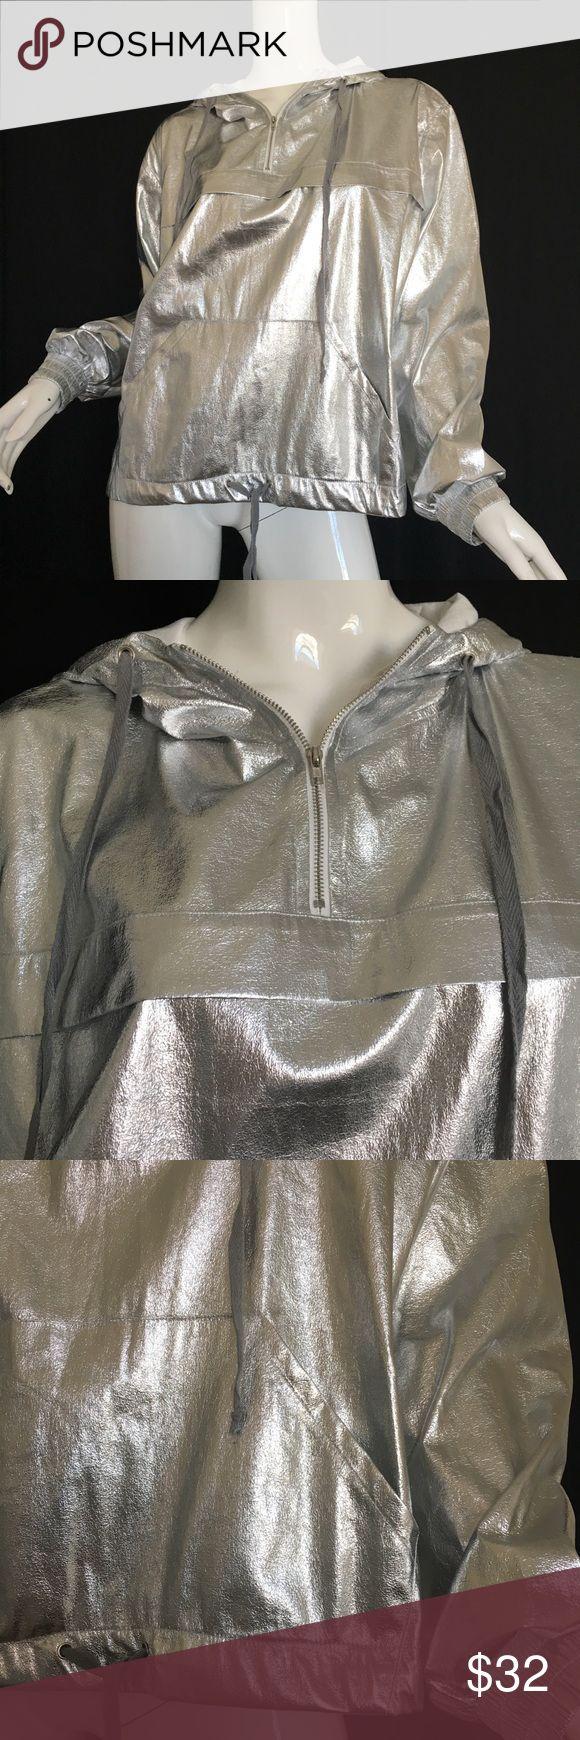 "Women's Metallic Hoodie XL Armpit to armpit 26"" Length 24"" Thin, soft fabric Say What? Tops Sweatshirts & Hoodies"